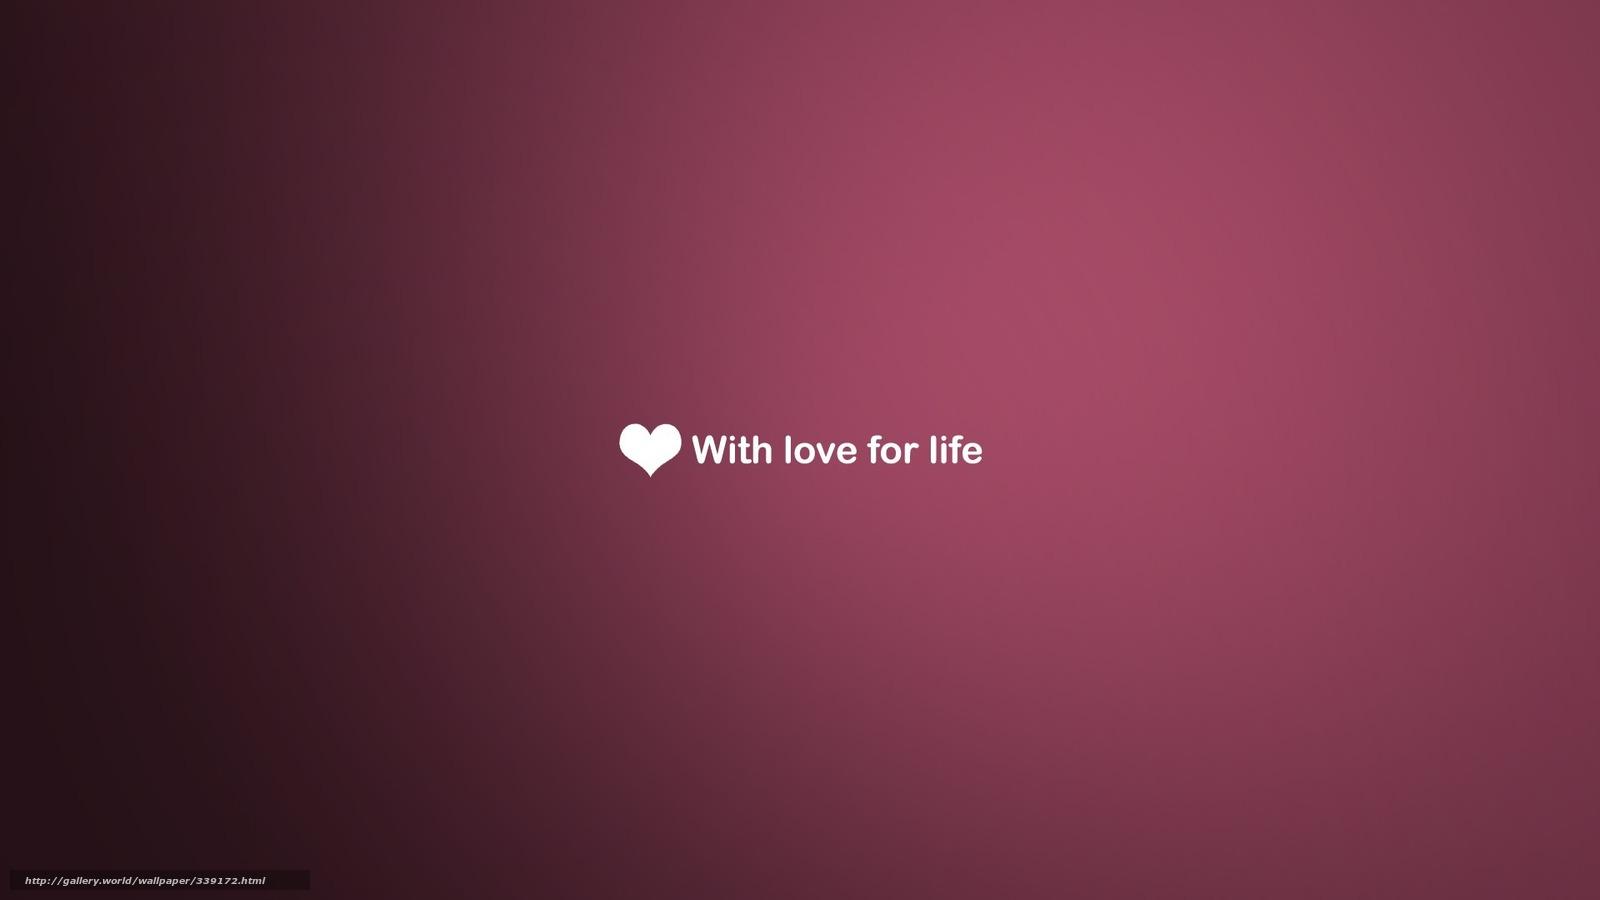 Tlcharger fond d 39 ecran amour bureau fond rose fonds d for Fond ecran amour